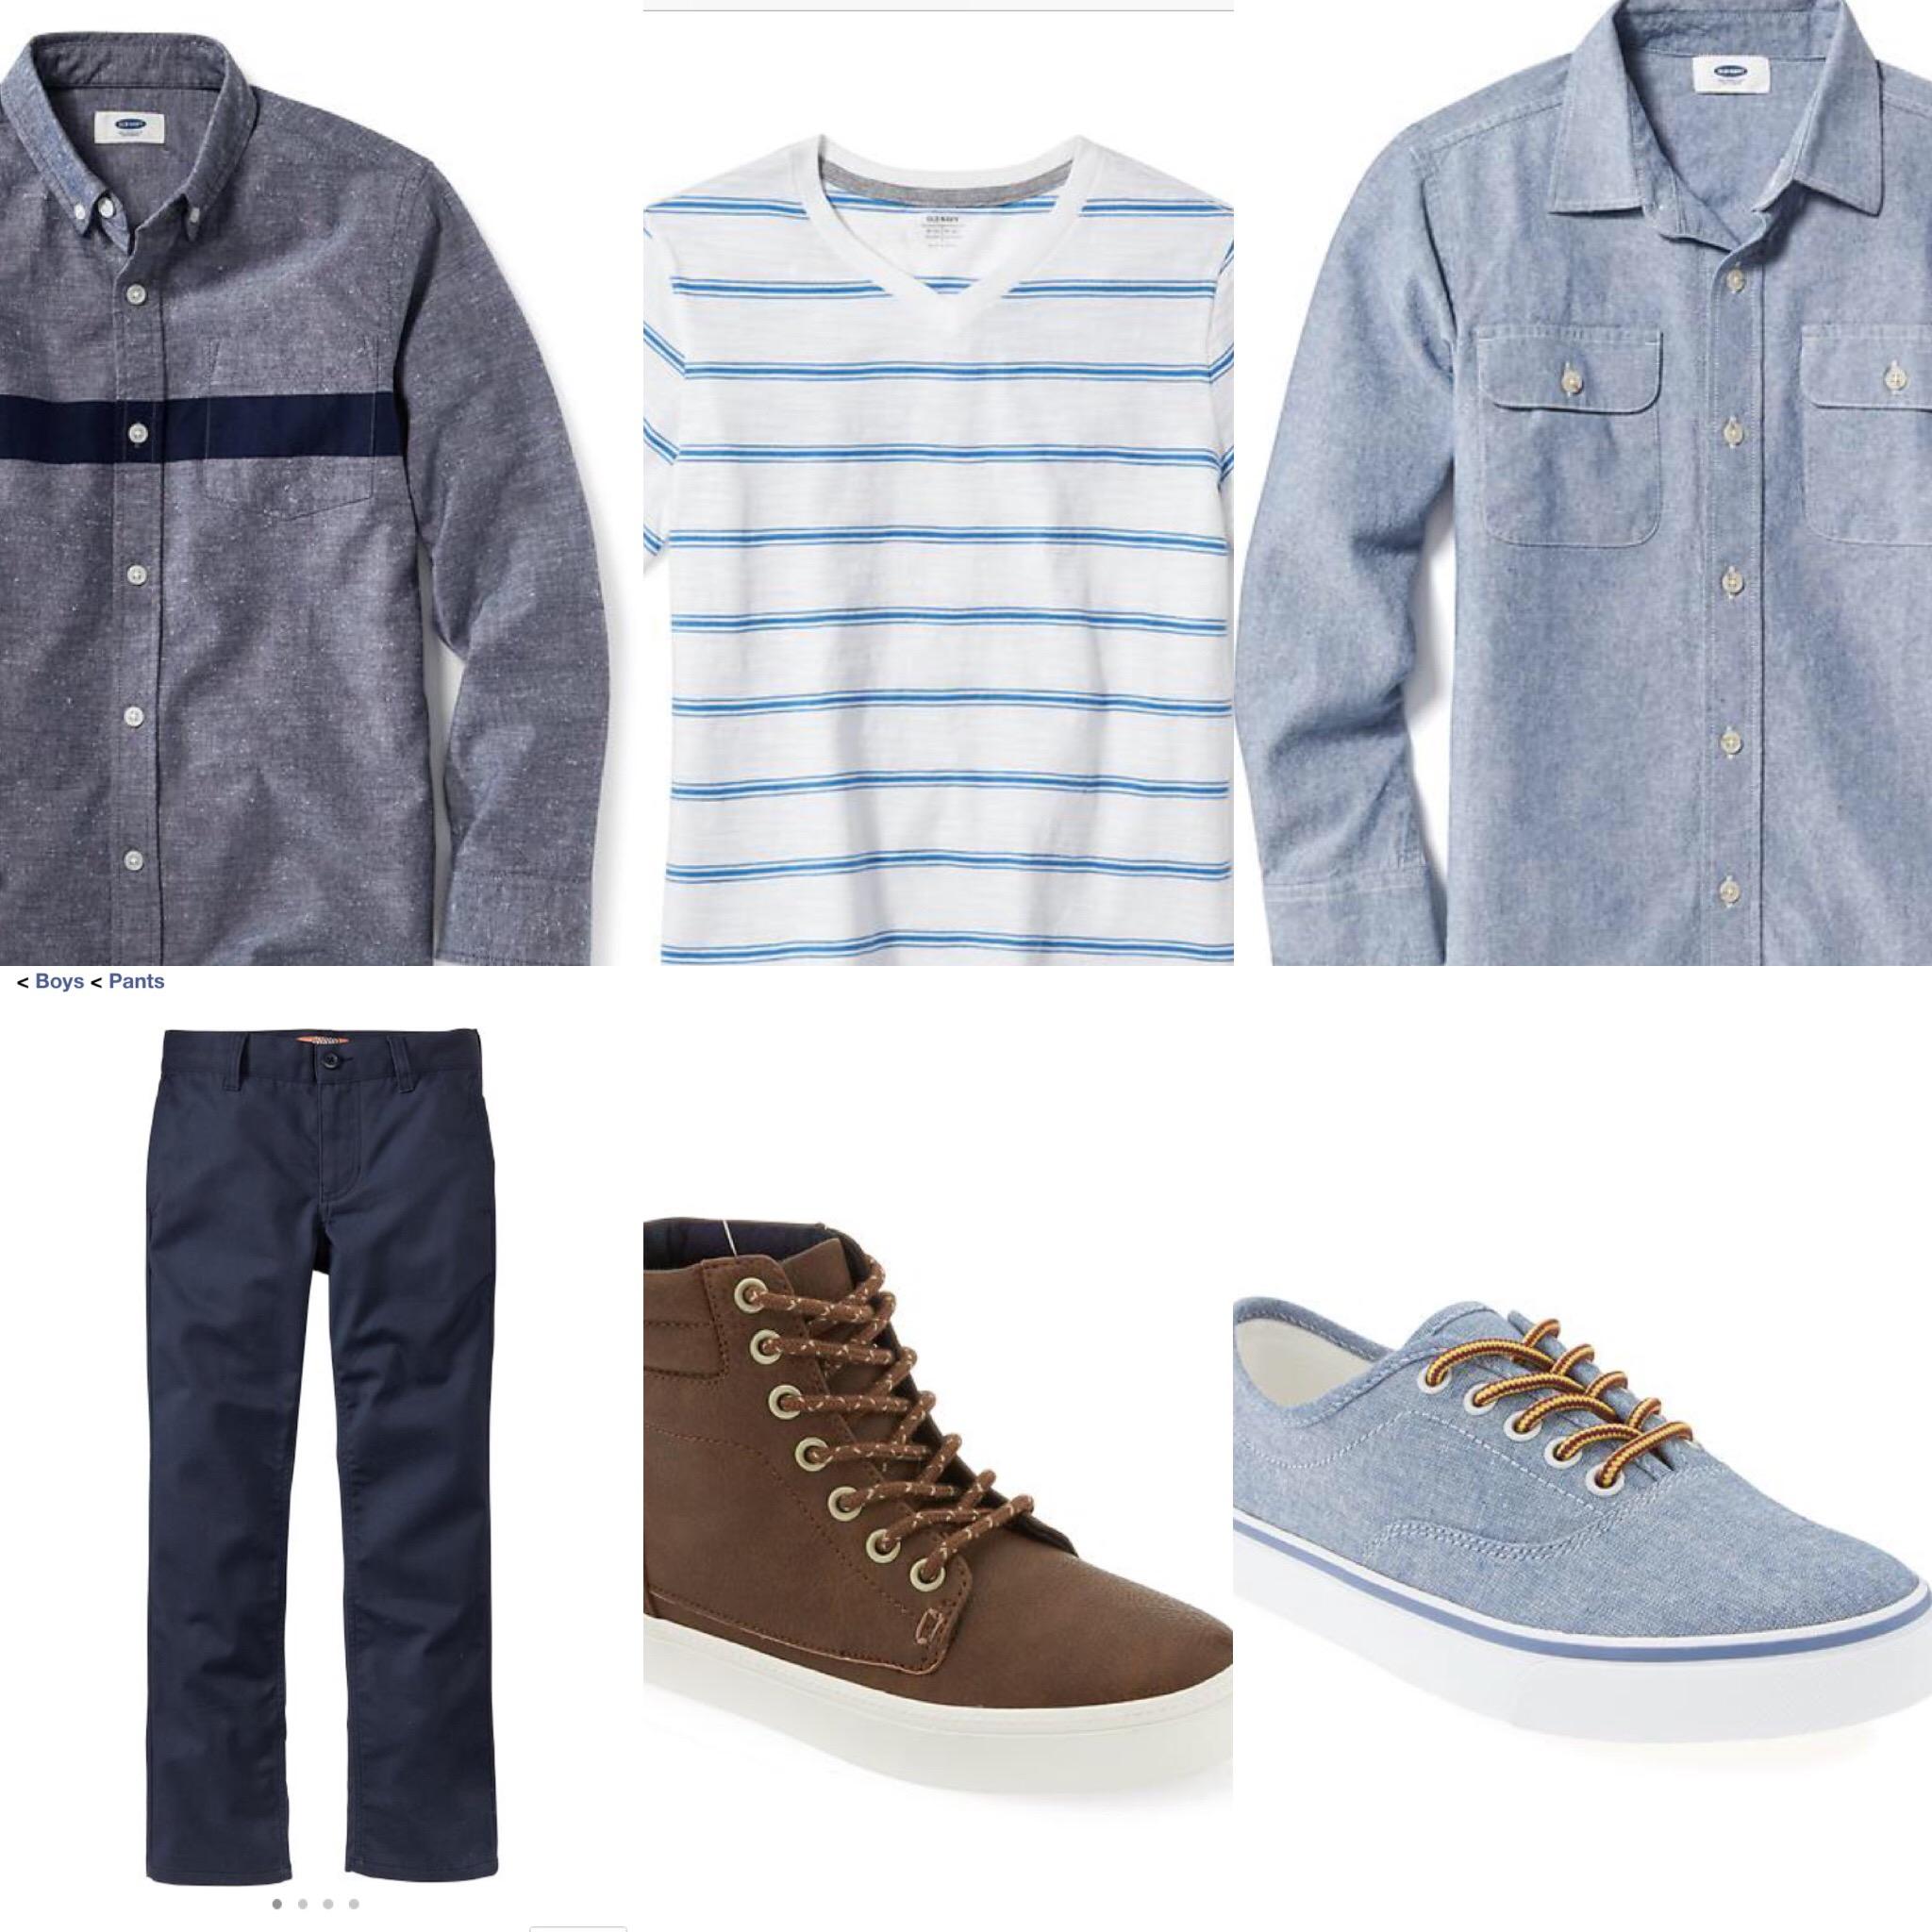 Boy's Clothing Pantone Blue